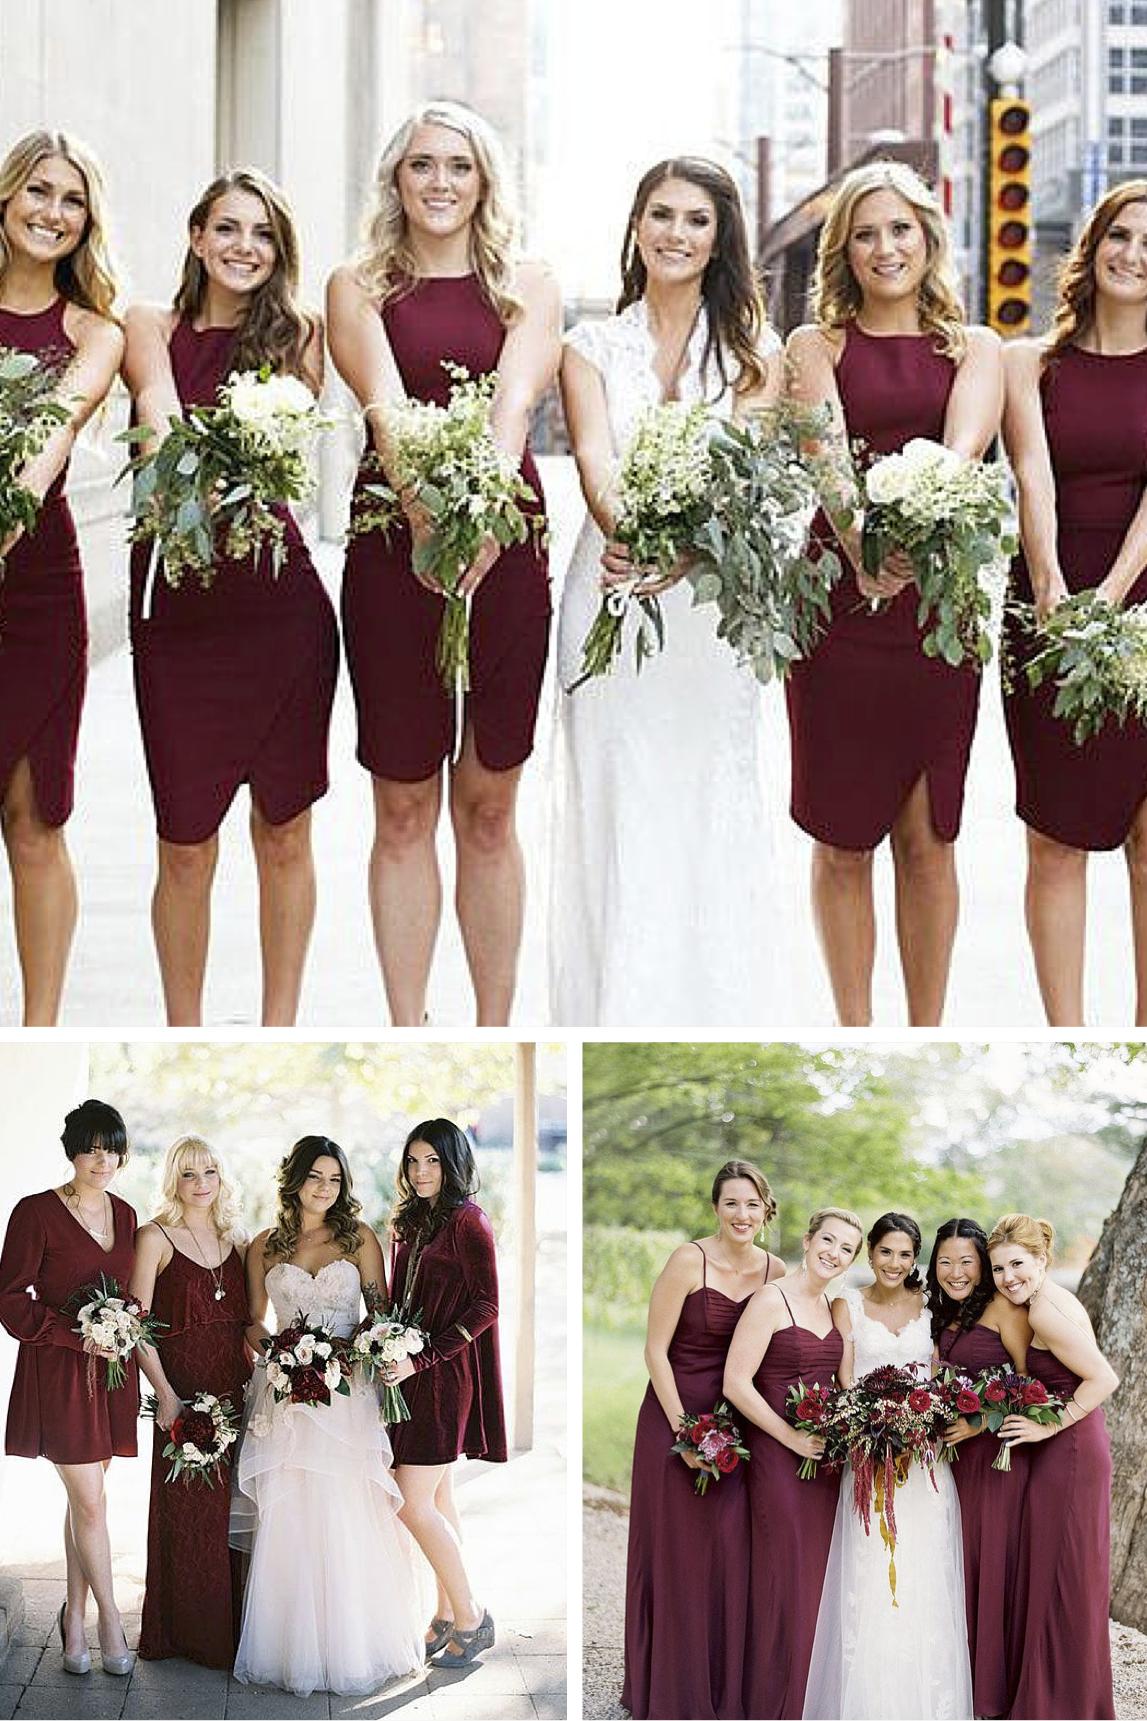 Wedding bridesmaid dresses pantone color of the year marsala wedding bridesmaid dresses pantone color of the year marsala annabelle events ombrellifo Choice Image